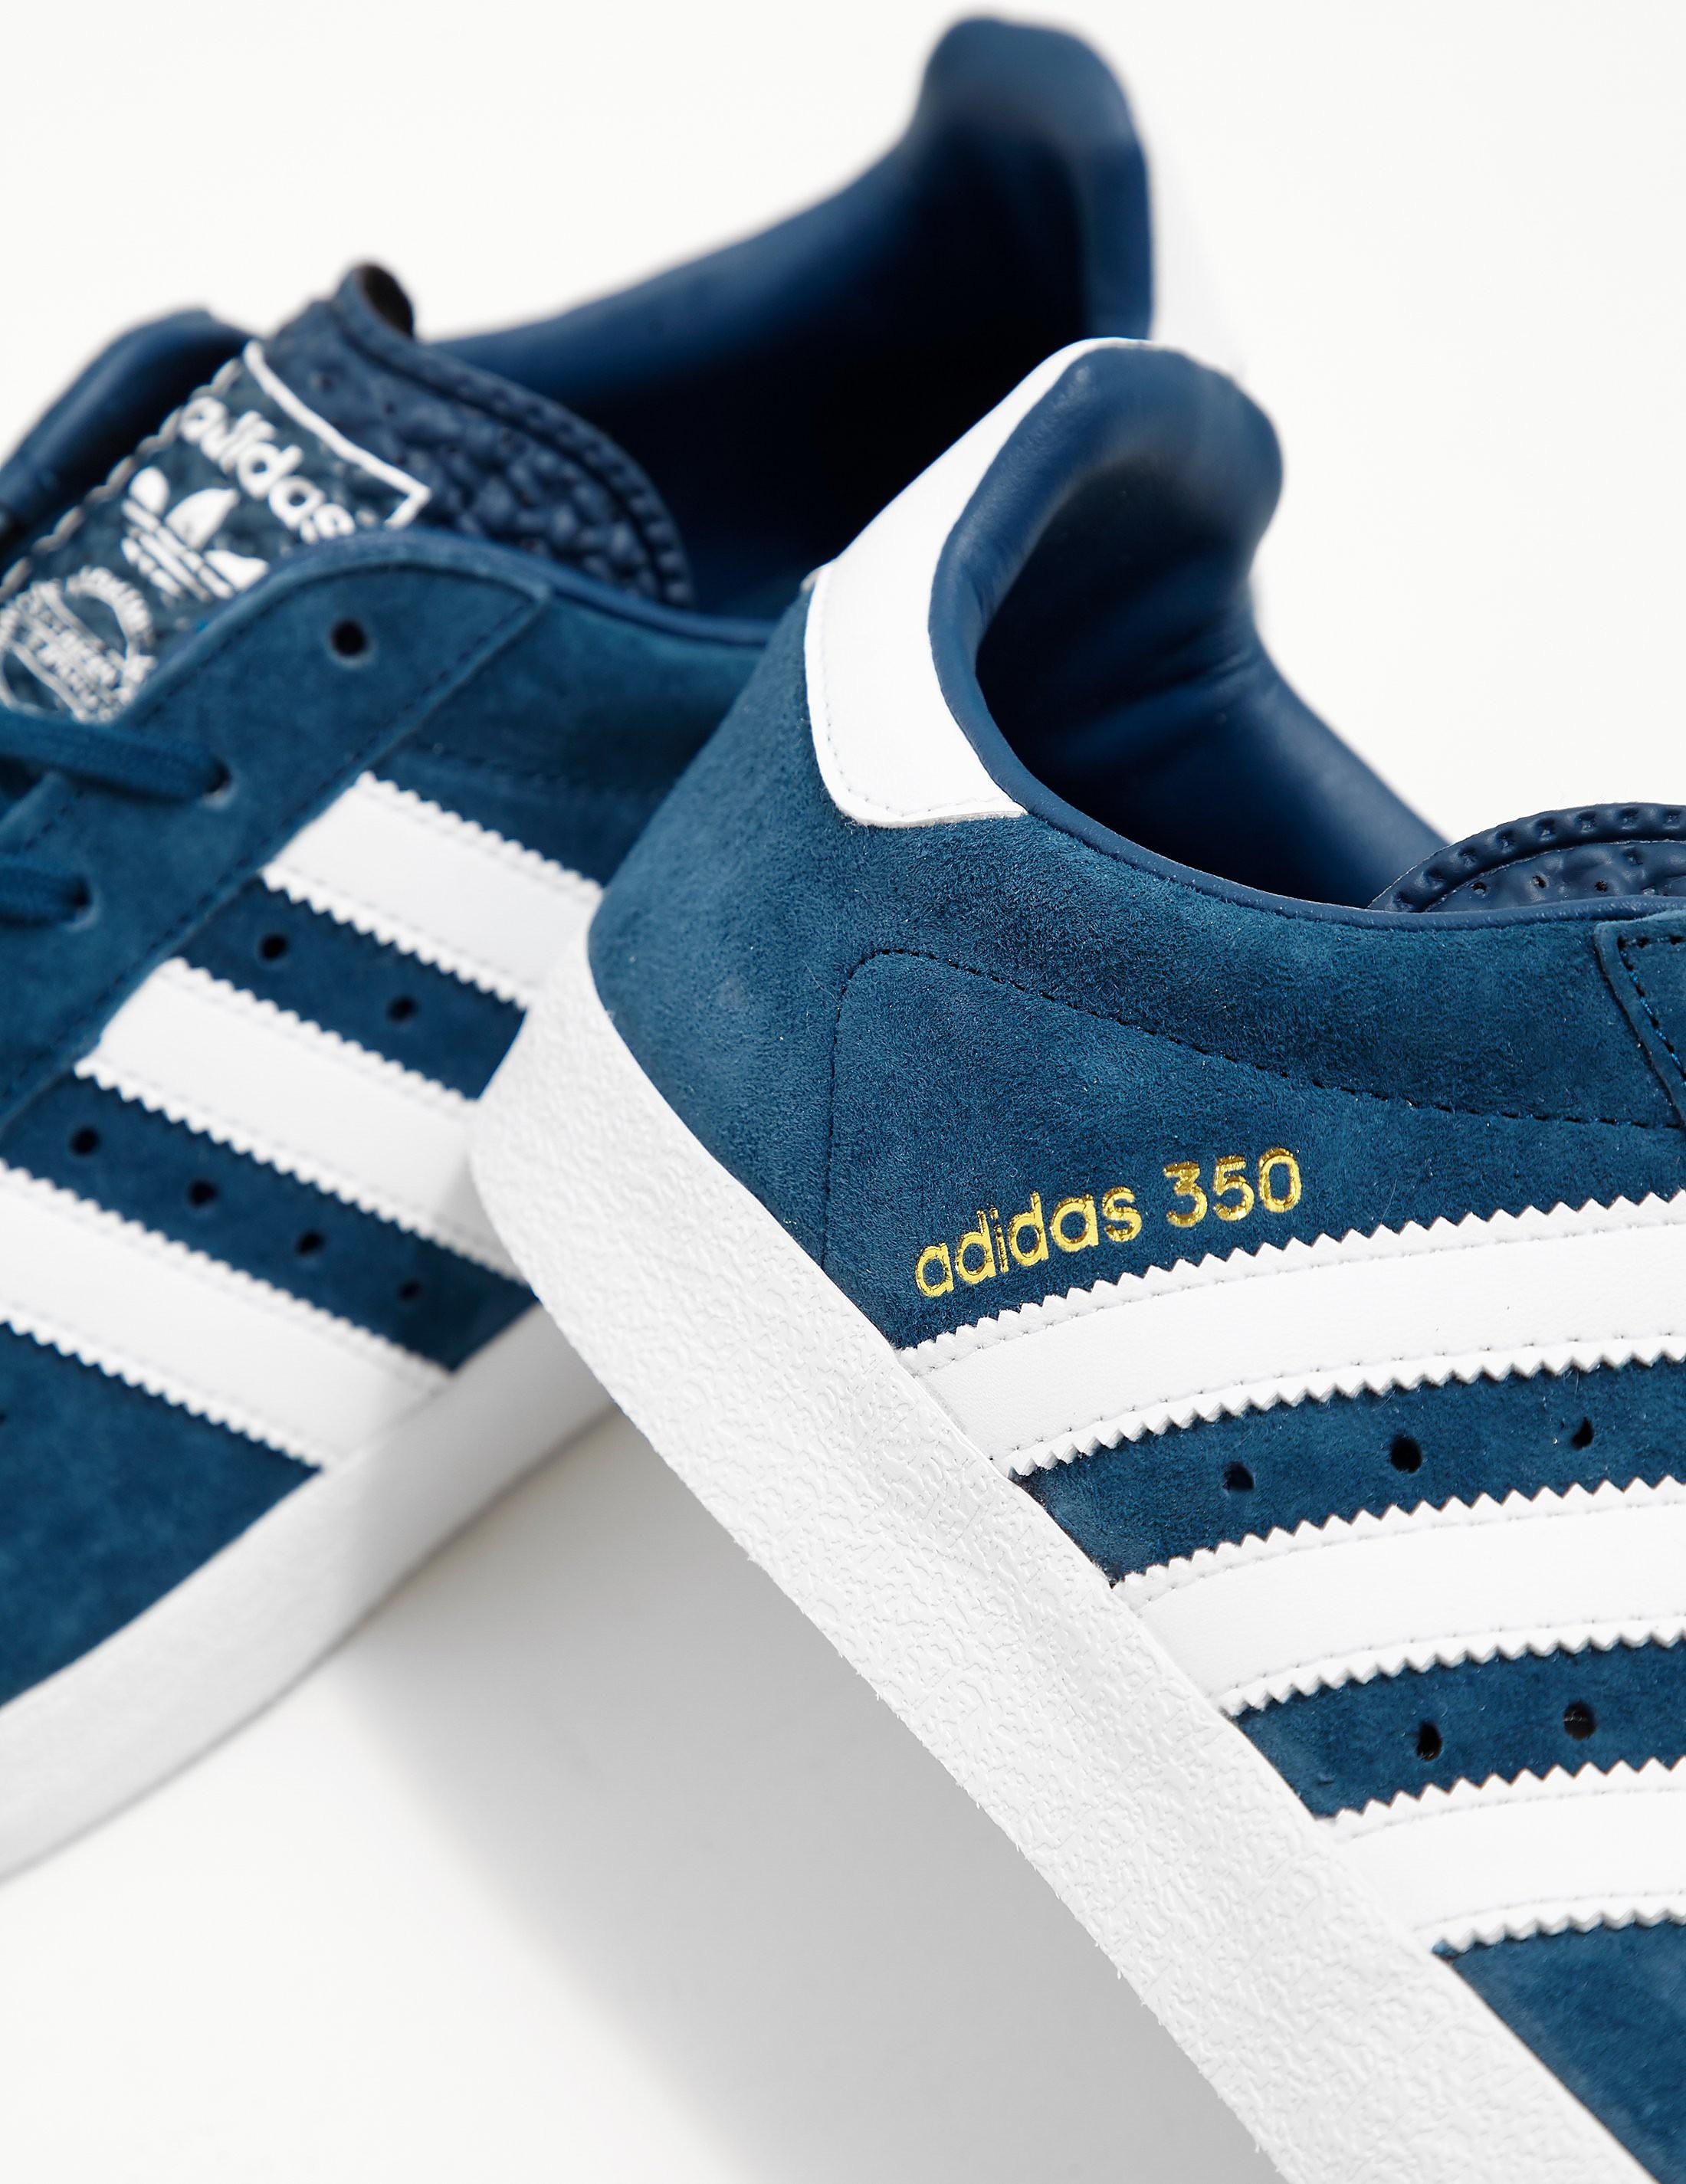 adidas Originals 350 Suede